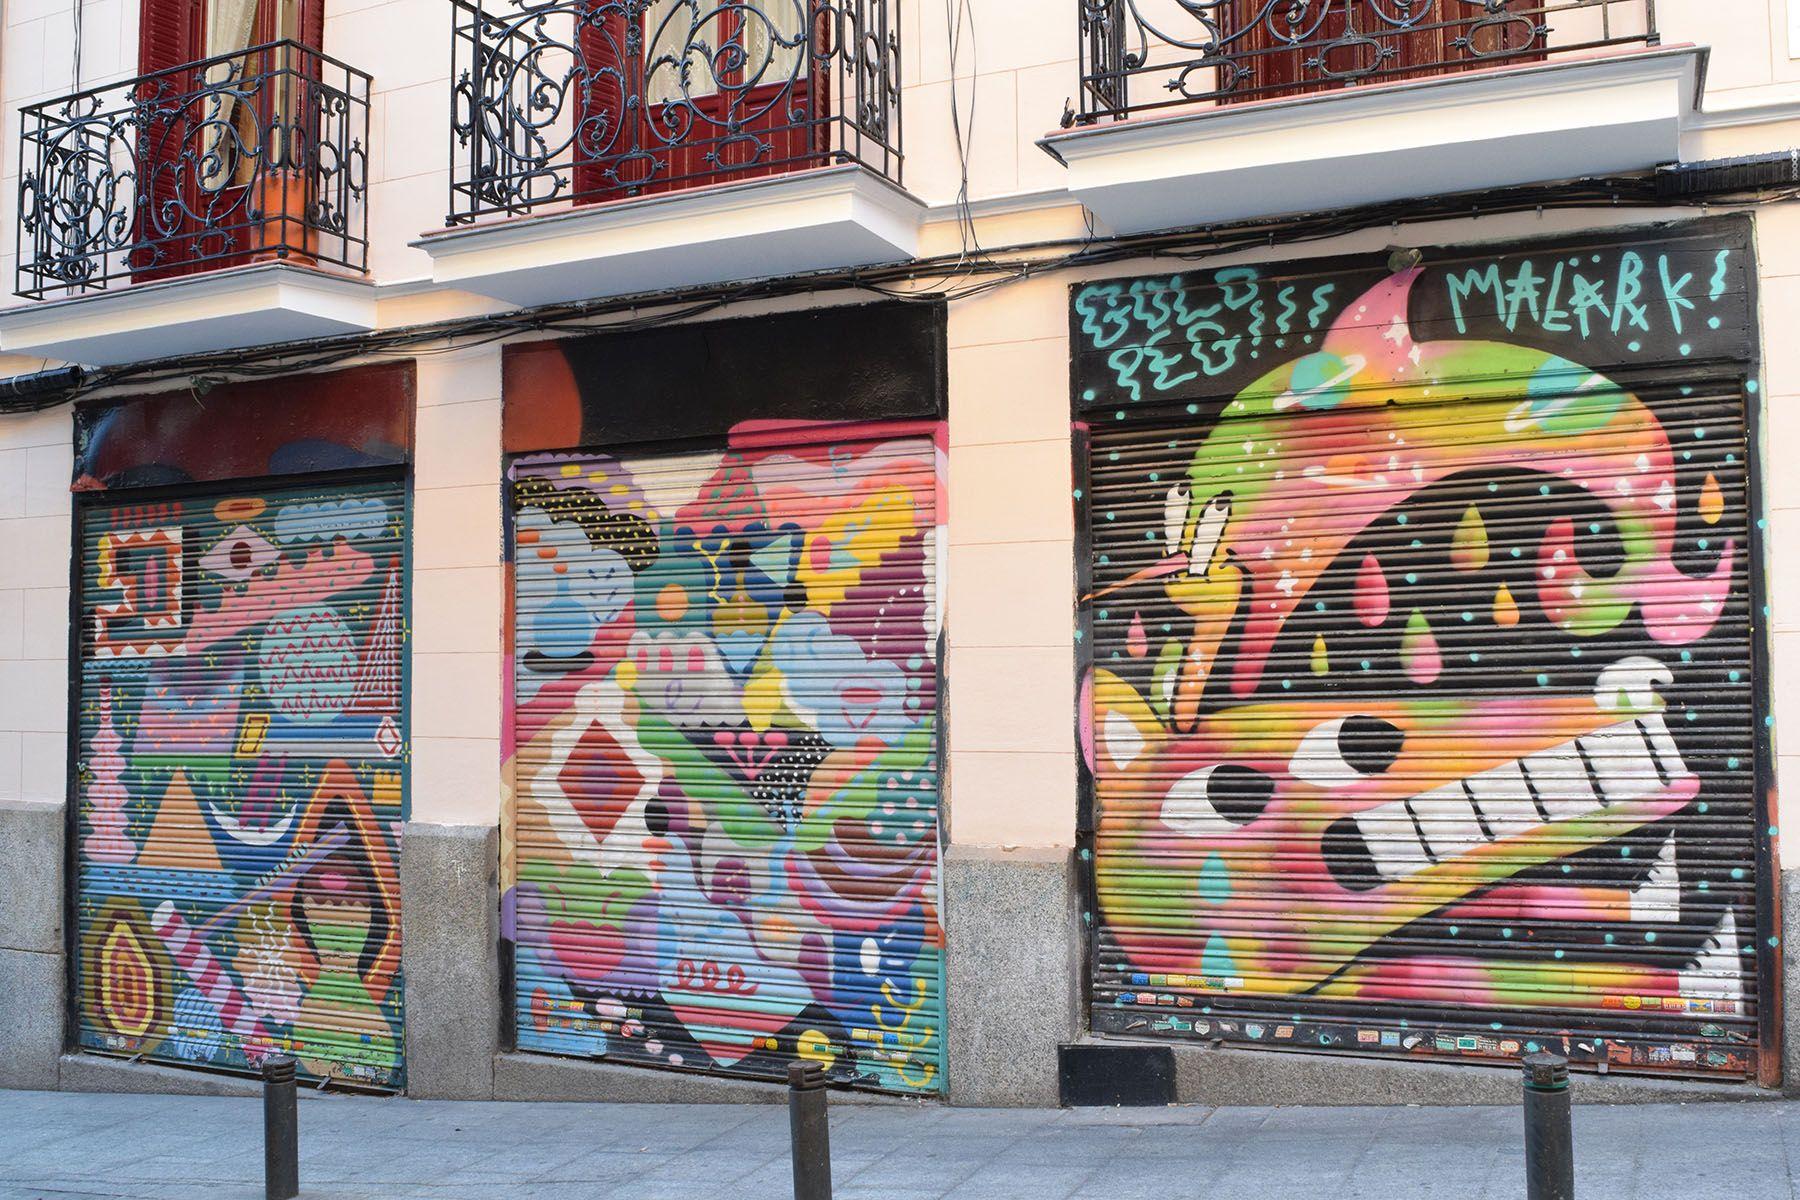 Calle San Blas Barrio Huertas Y Las Letras Madrid 2015 Arte Urbano Arte Graffiti